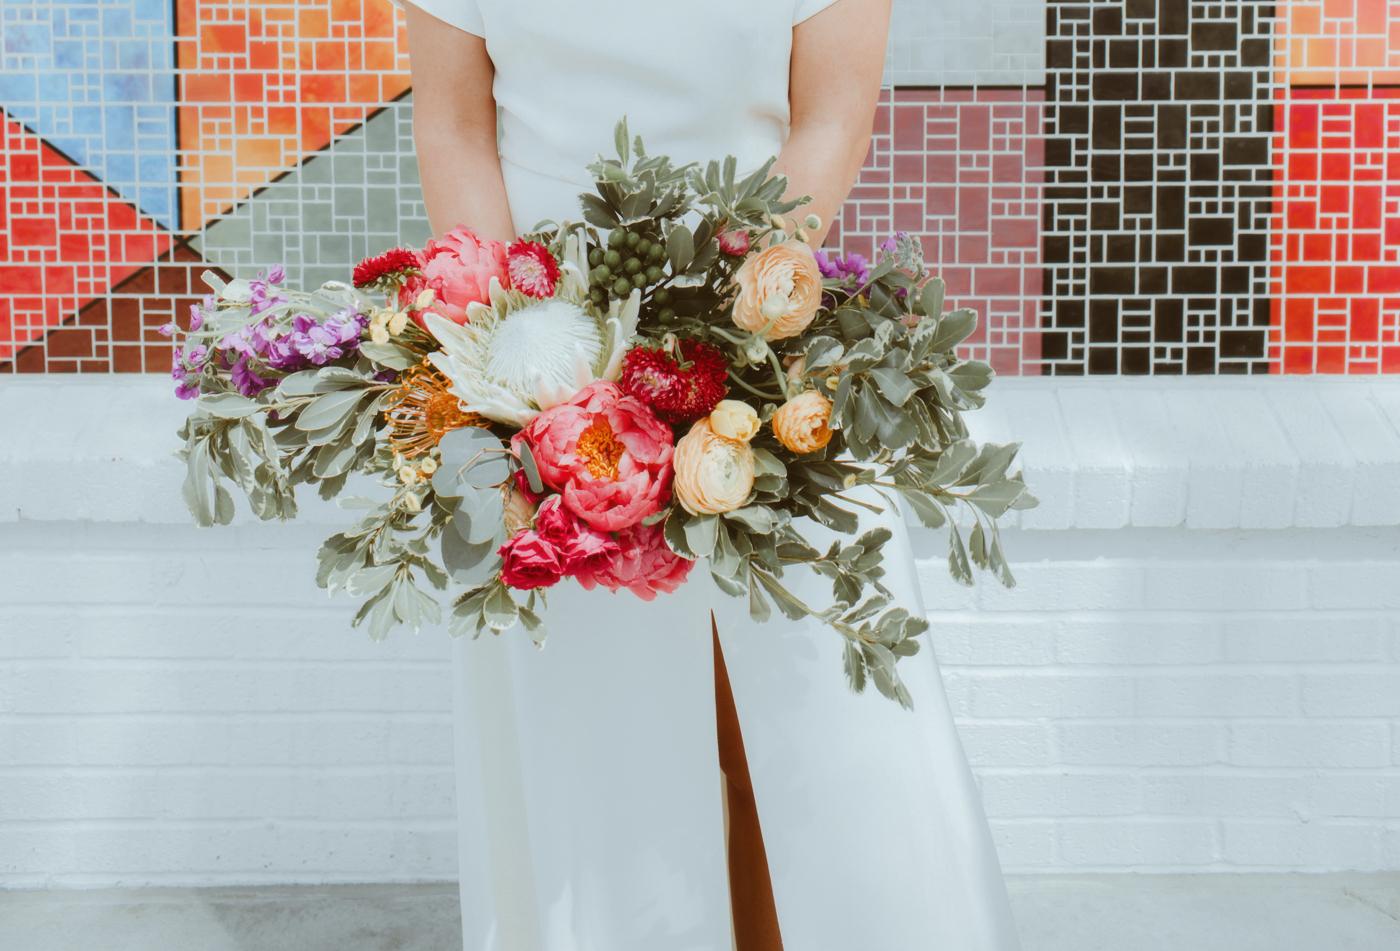 Wedding | Canvas Market | Lake Nona-Orlando, FL  | Vanessa Boy Photography | vanessaboy.com-253.com |Green Wedding Shoes.jpg